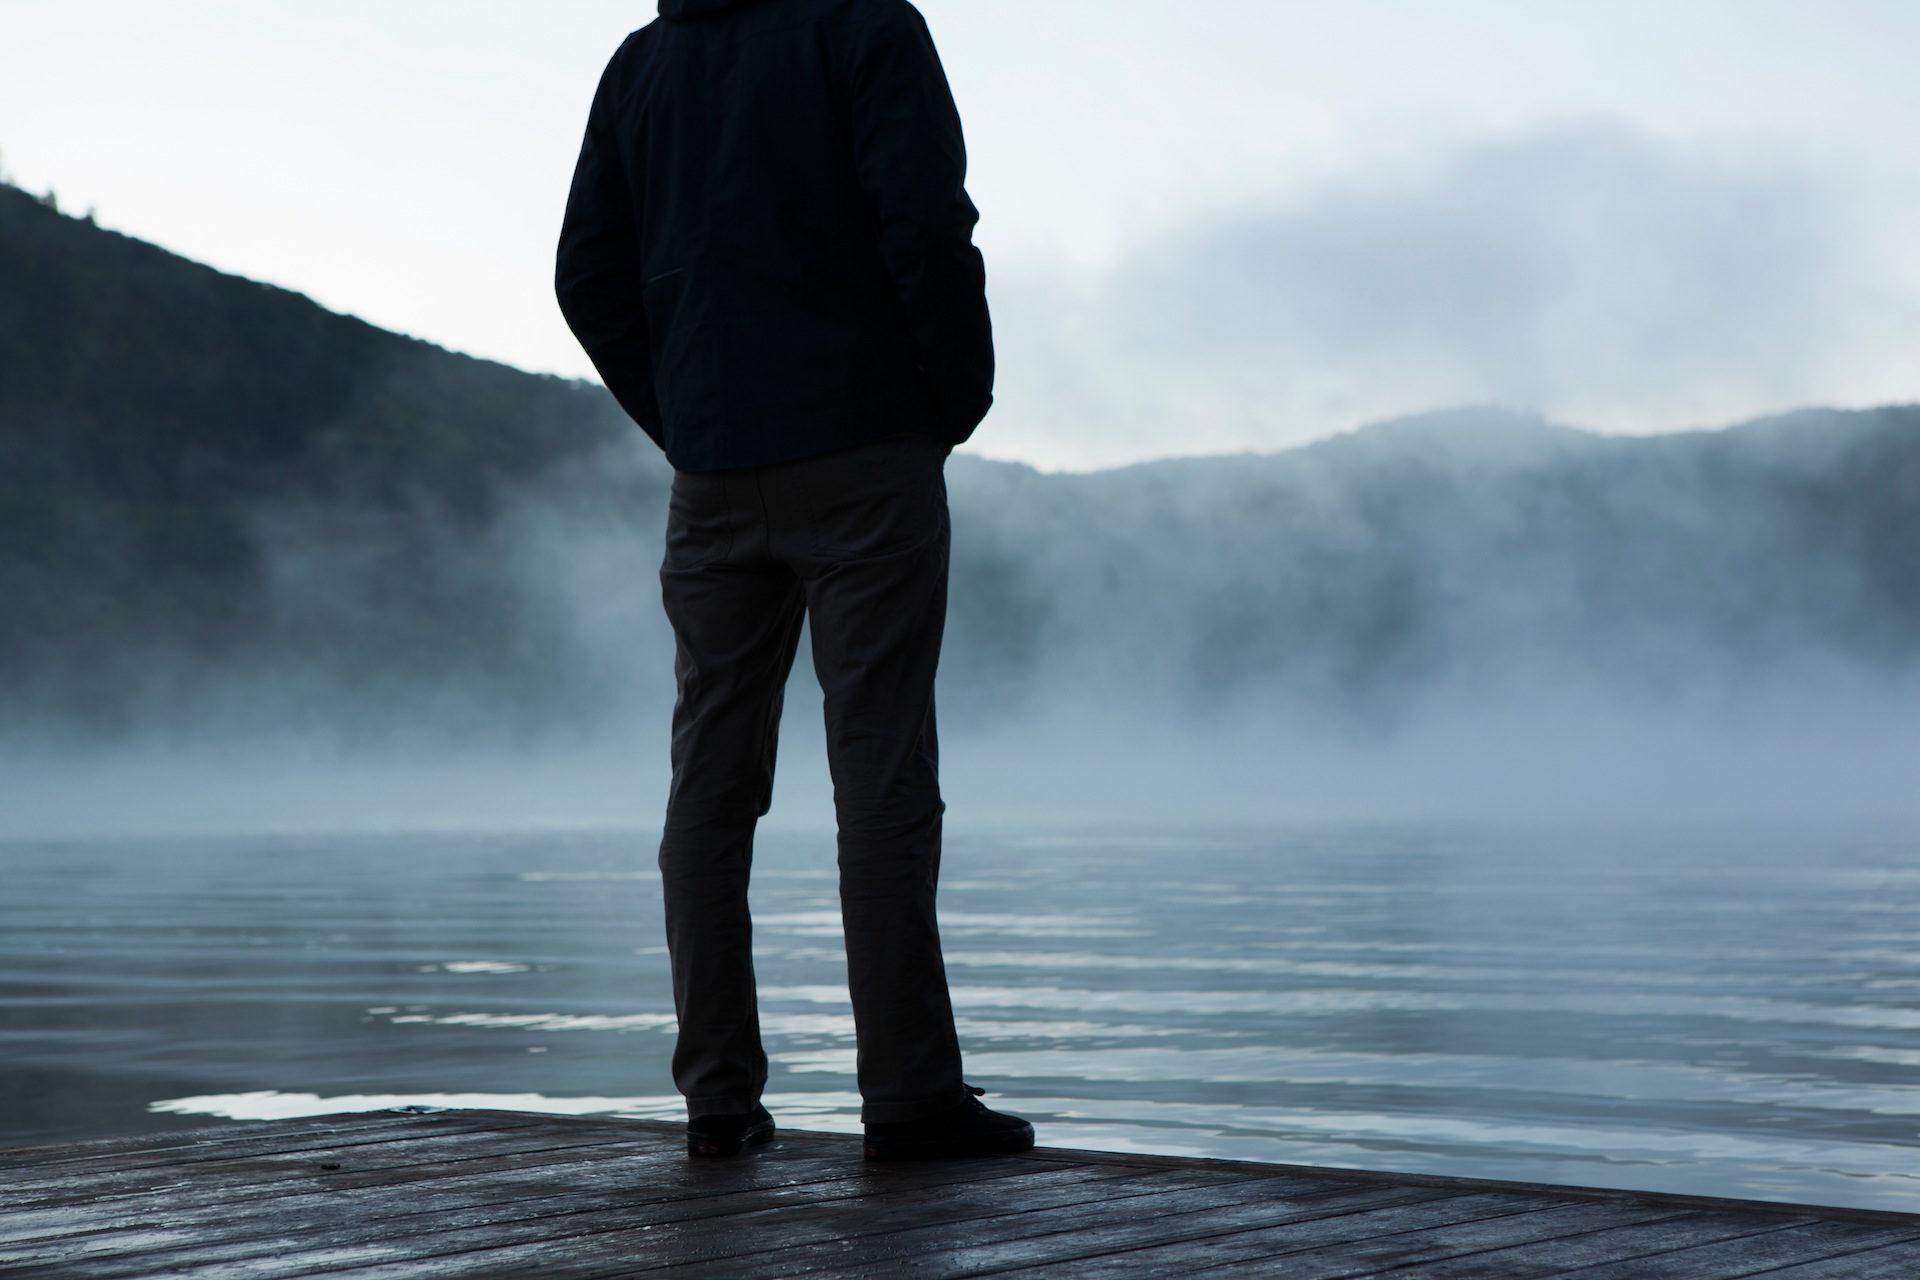 Mann, Lake, Nebel, Embarcadero, Montañas - Wallpaper HD - Prof.-falken.com